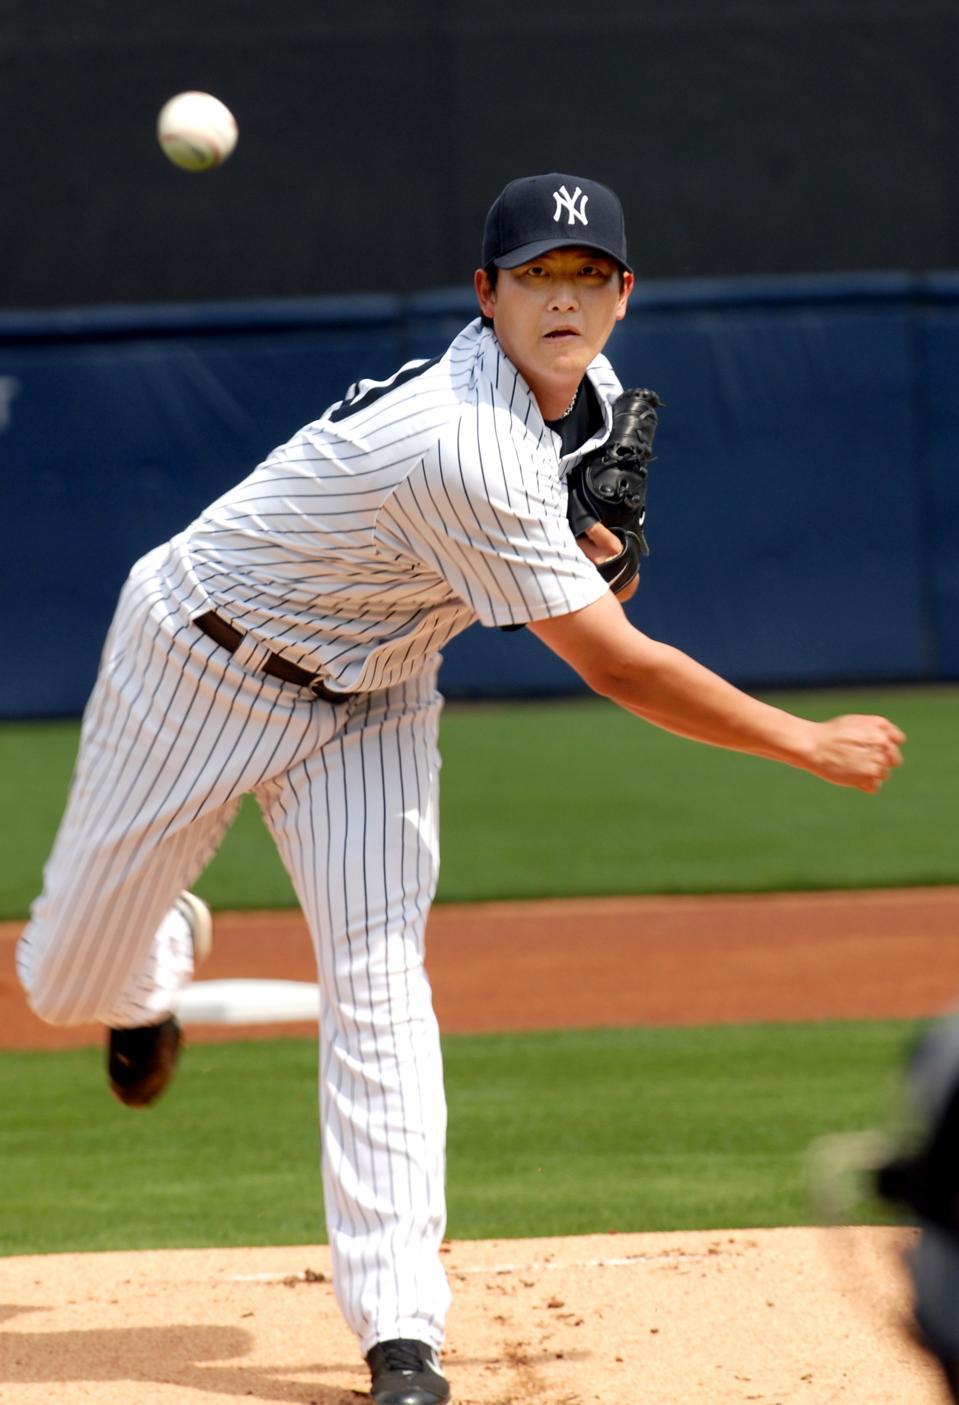 Taiwan To Achieve Goal That Eludes U.S.: Open Baseball Season This Month